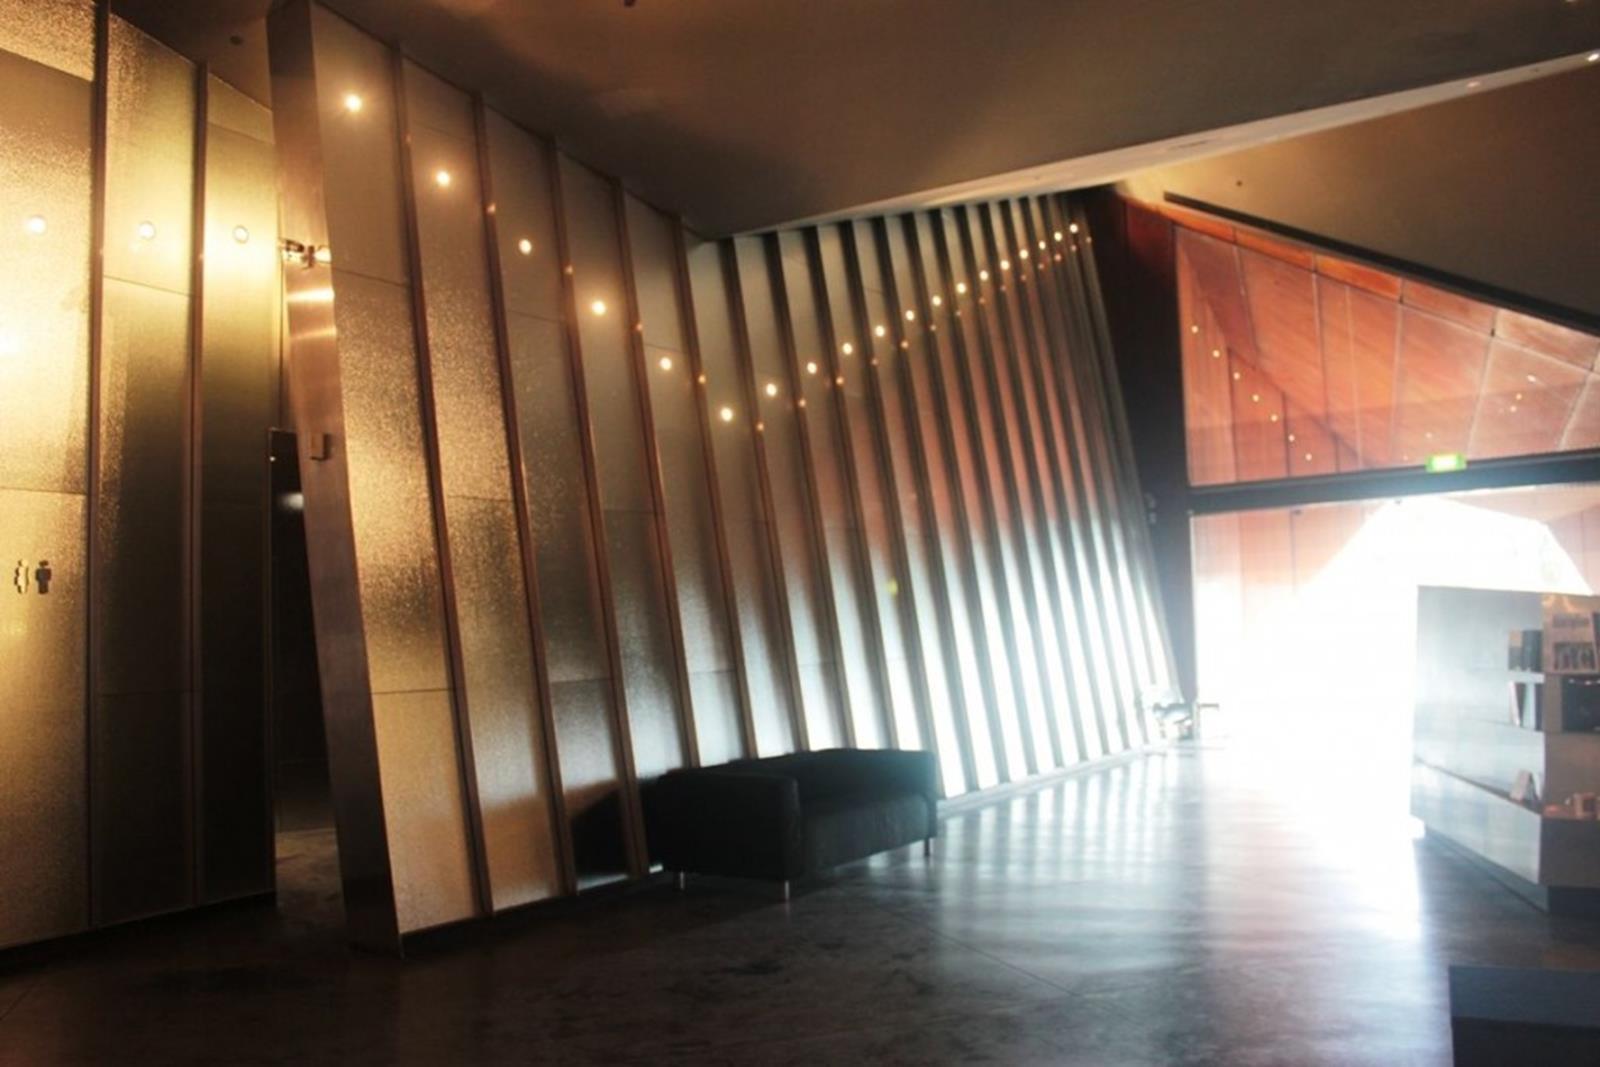 Australian Center of Contemporary Art (ACCA) Interior